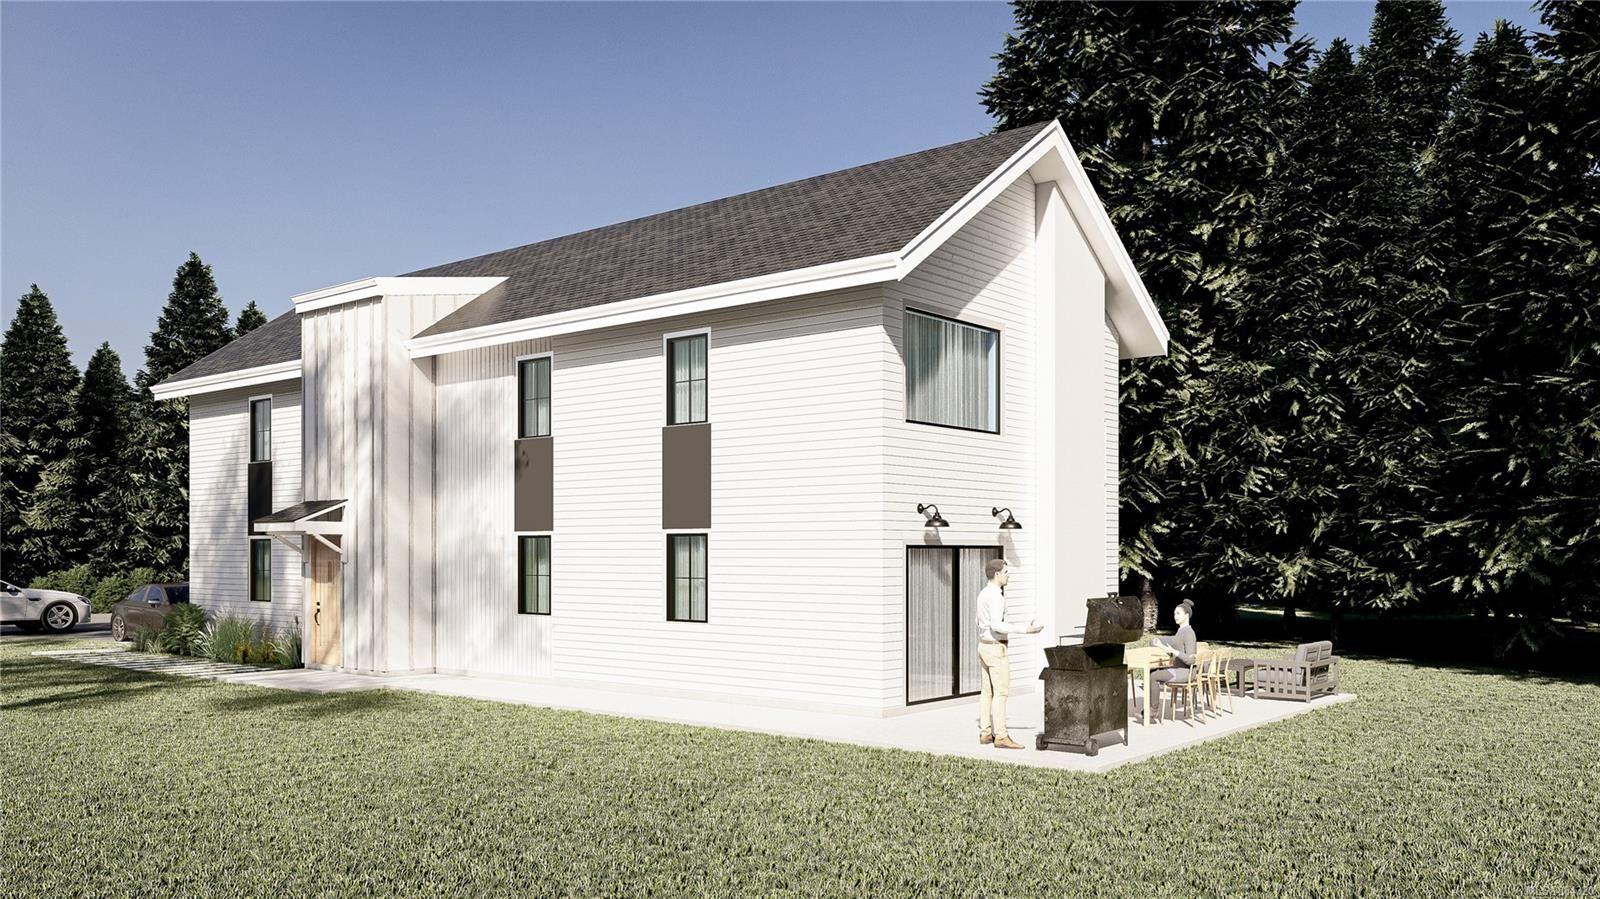 Main Photo: 1473 Tharratt Rd in : ML Shawnigan House for sale (Malahat & Area)  : MLS®# 884320